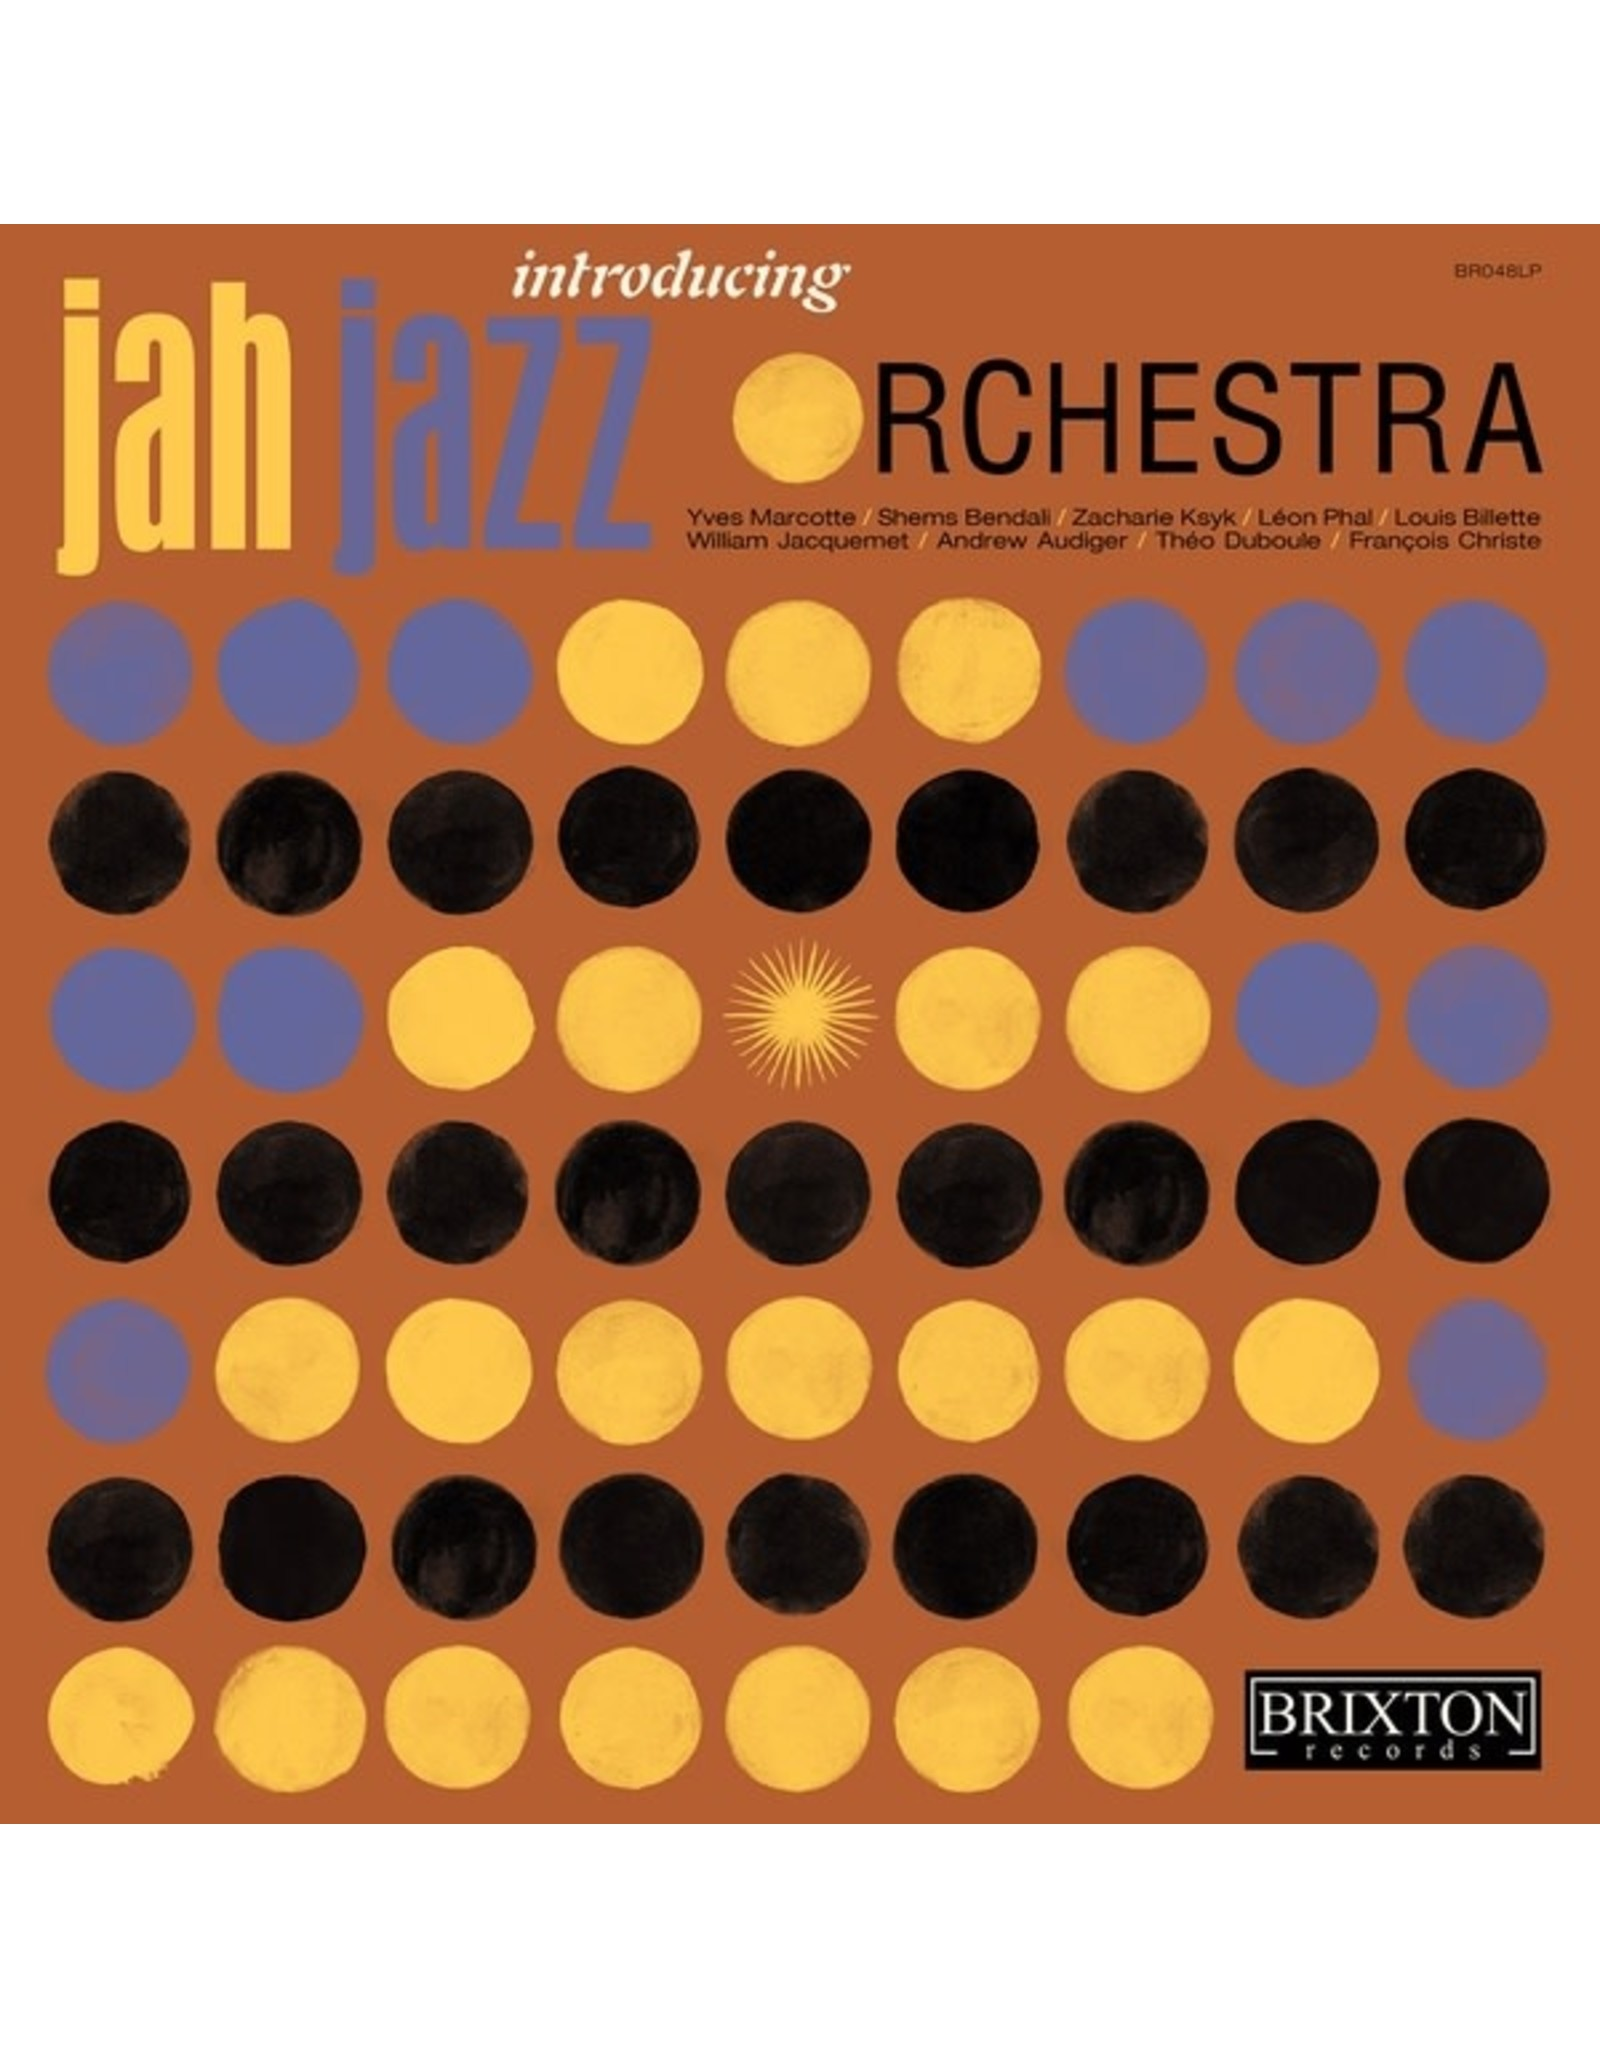 New Vinyl Jah Jazz Orchestra - Introducing Jah Jazz Orchestra LP